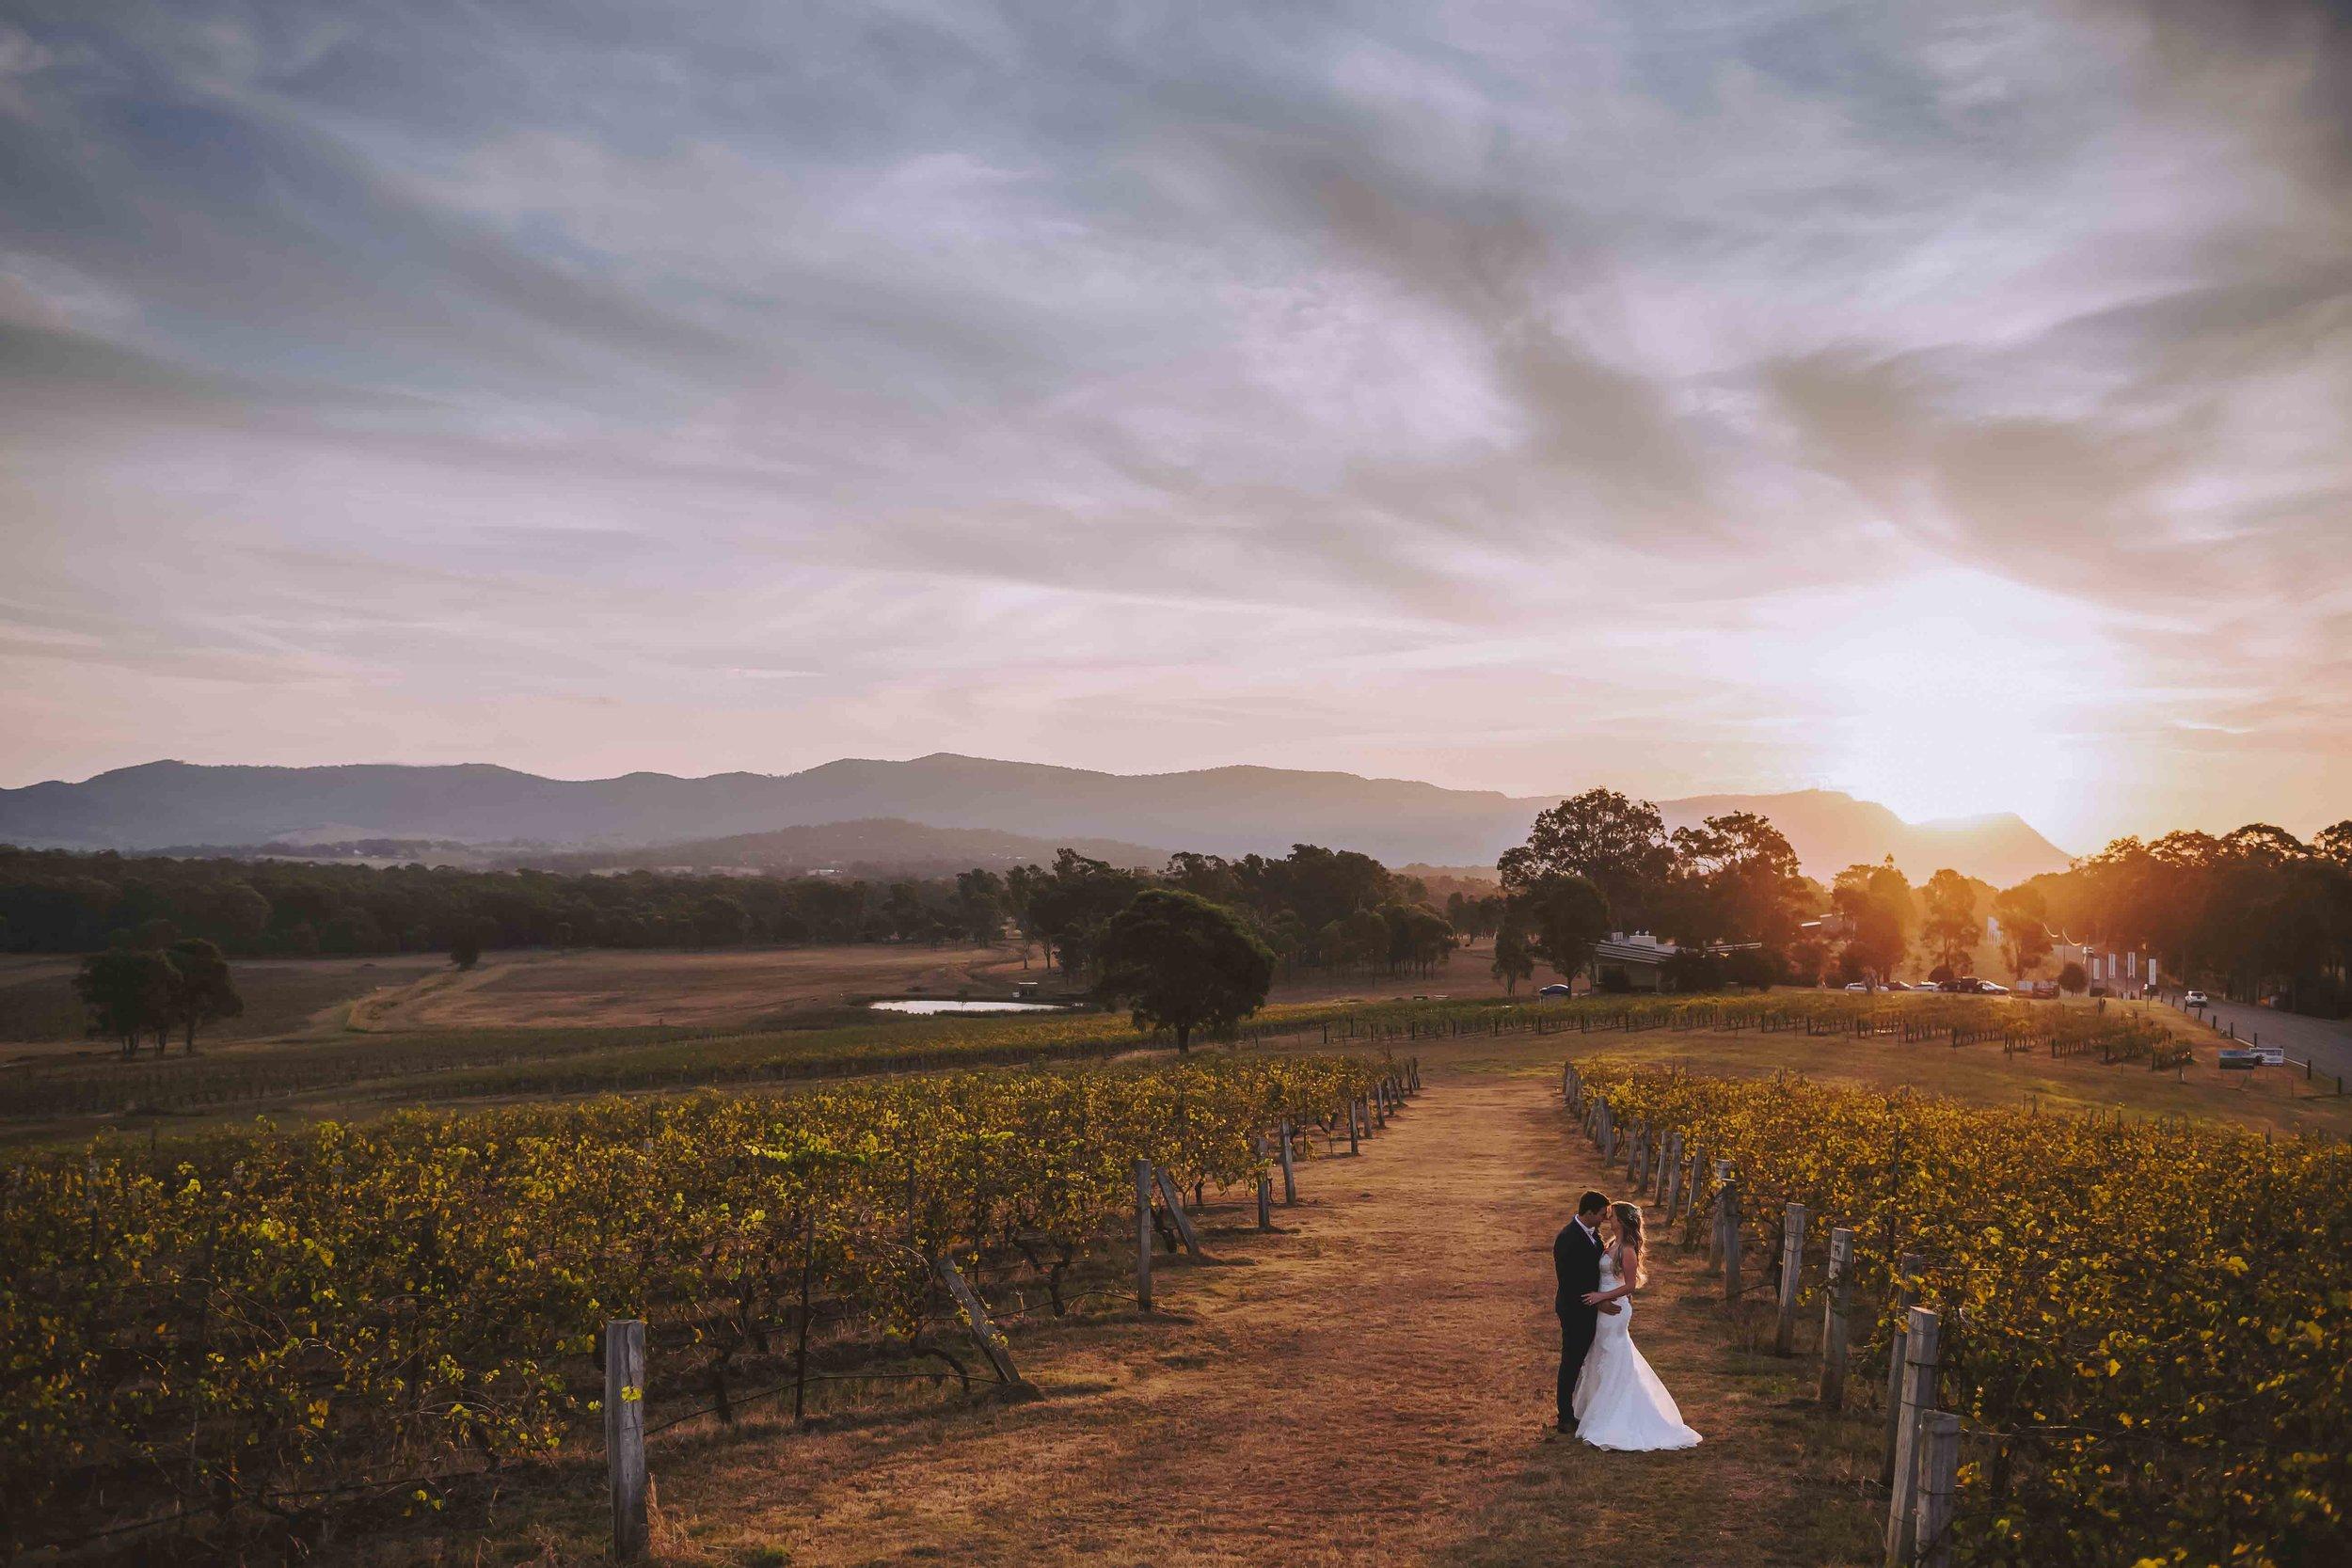 Feather & Birch_ Wedding Photography_Queensberry-4.jpg